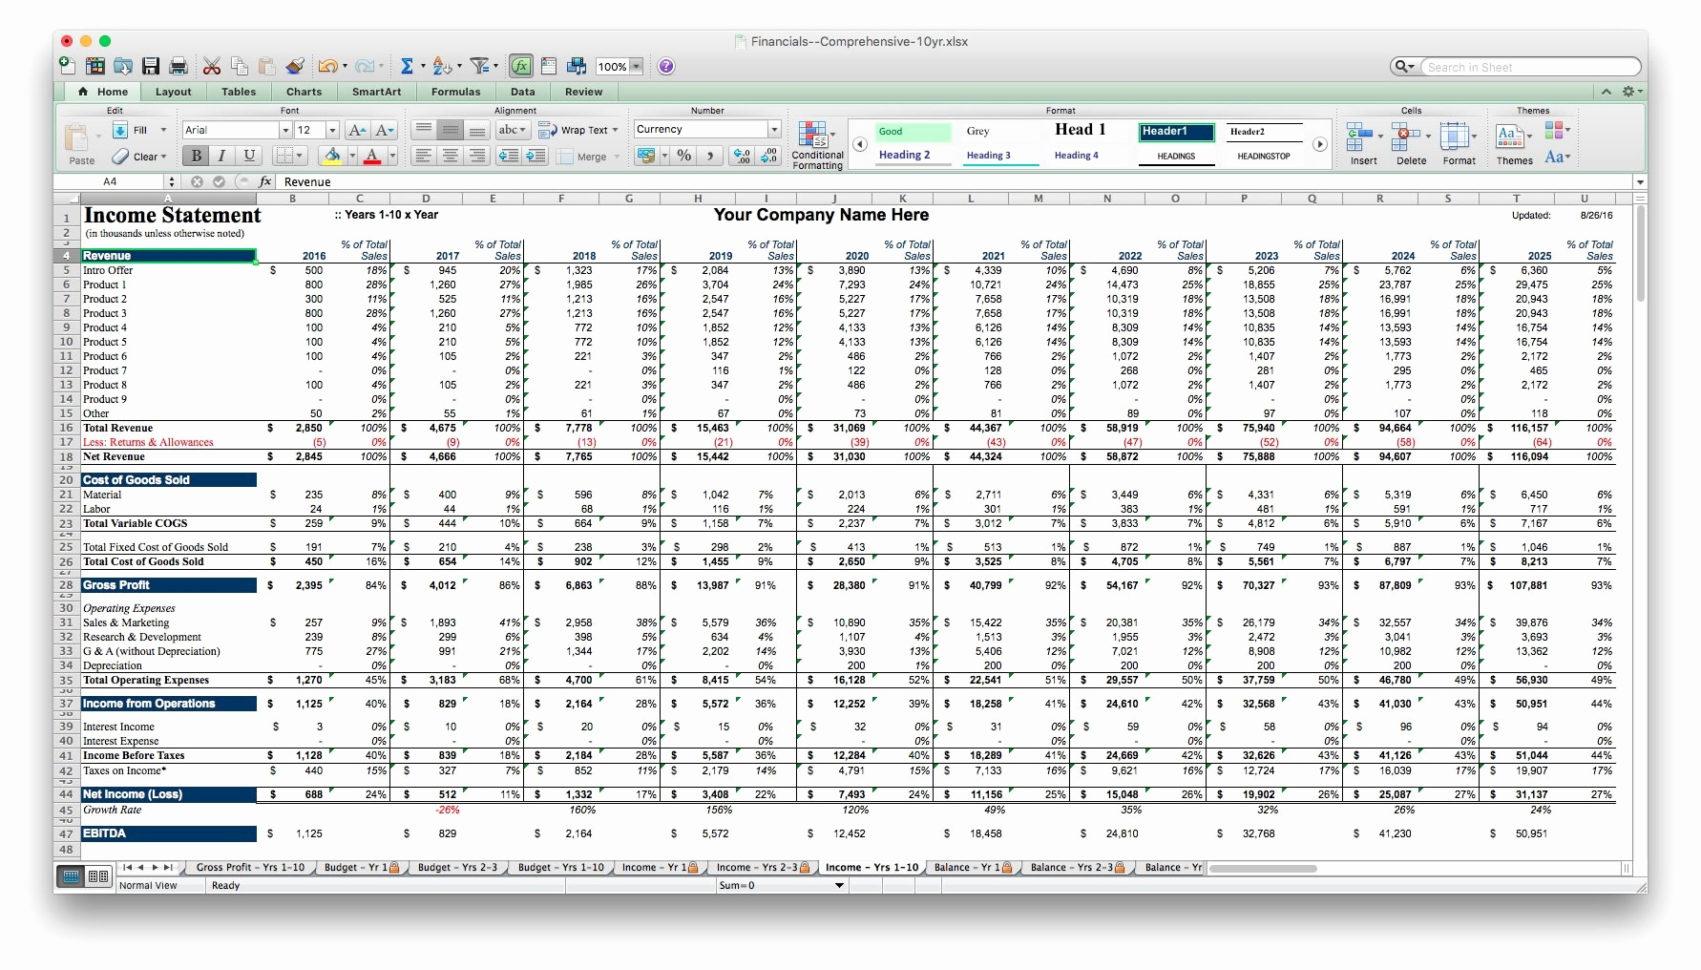 Financial Planning Spreadsheet For Startups On Spreadsheet For Mac And Financial Planning Excel Spreadsheet